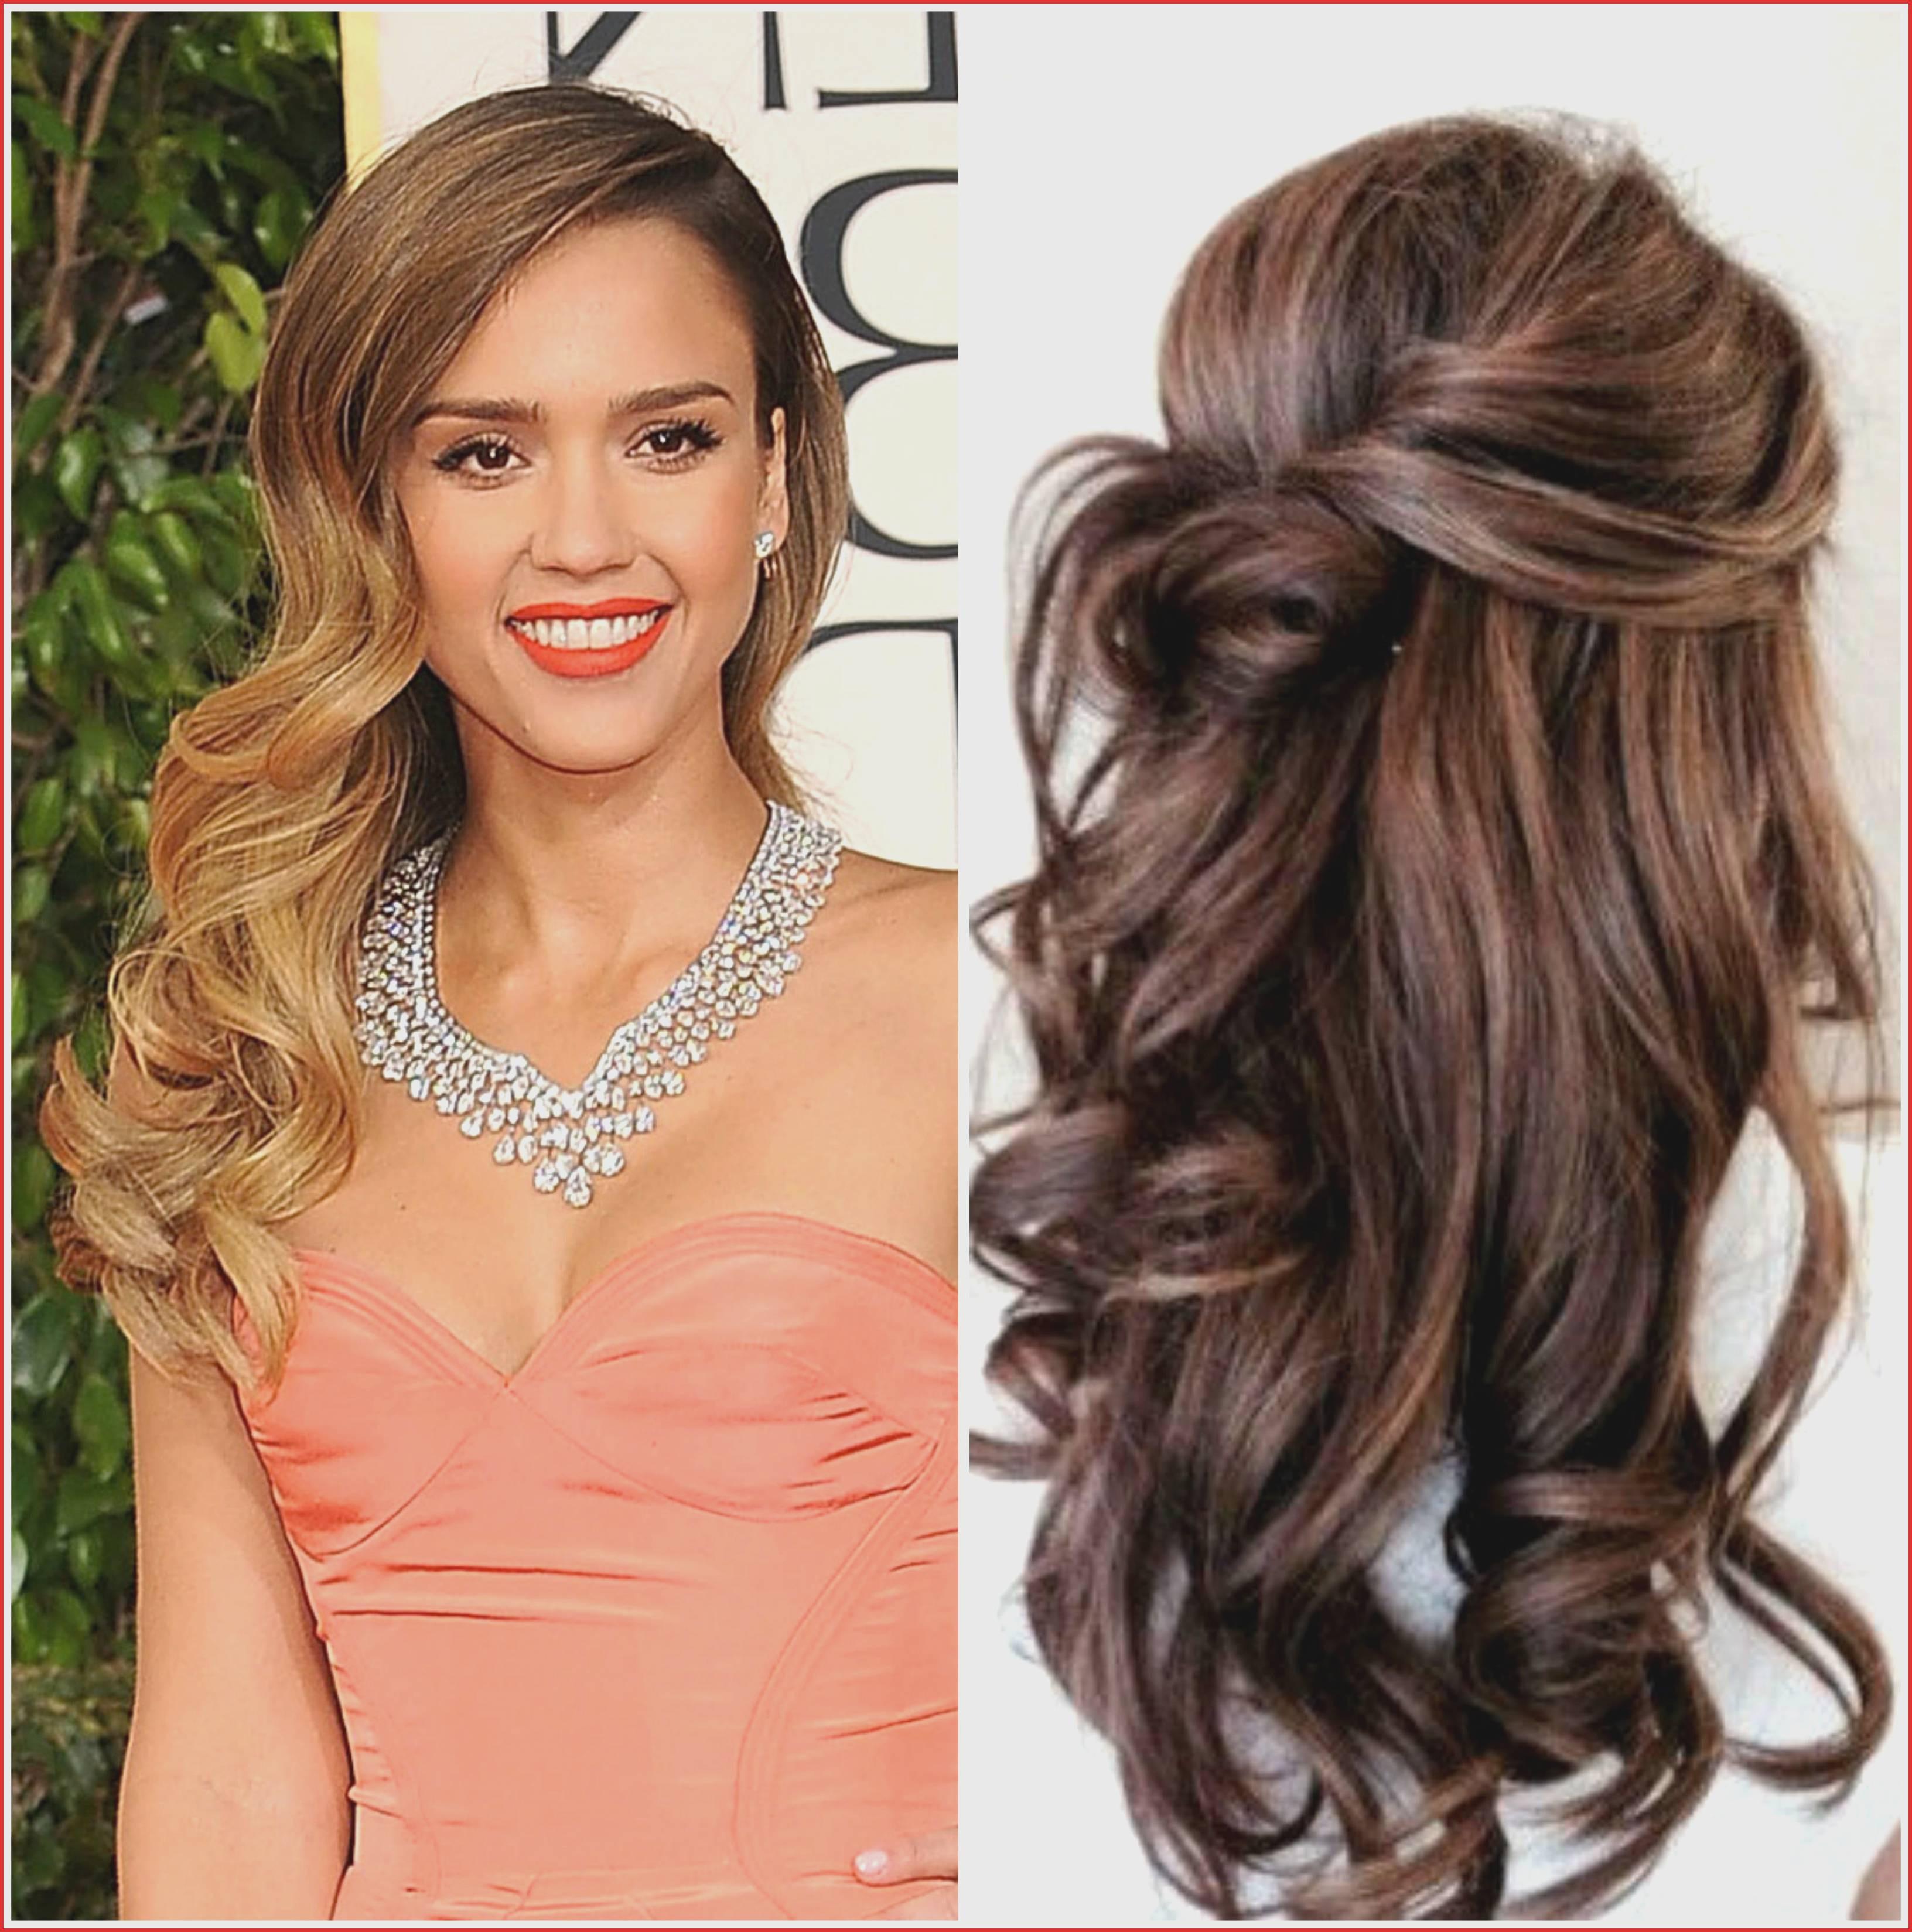 Best Hairstyles For Widows Peak Female  Find out Full Gallery of New Widows Peak Hairstyles Women